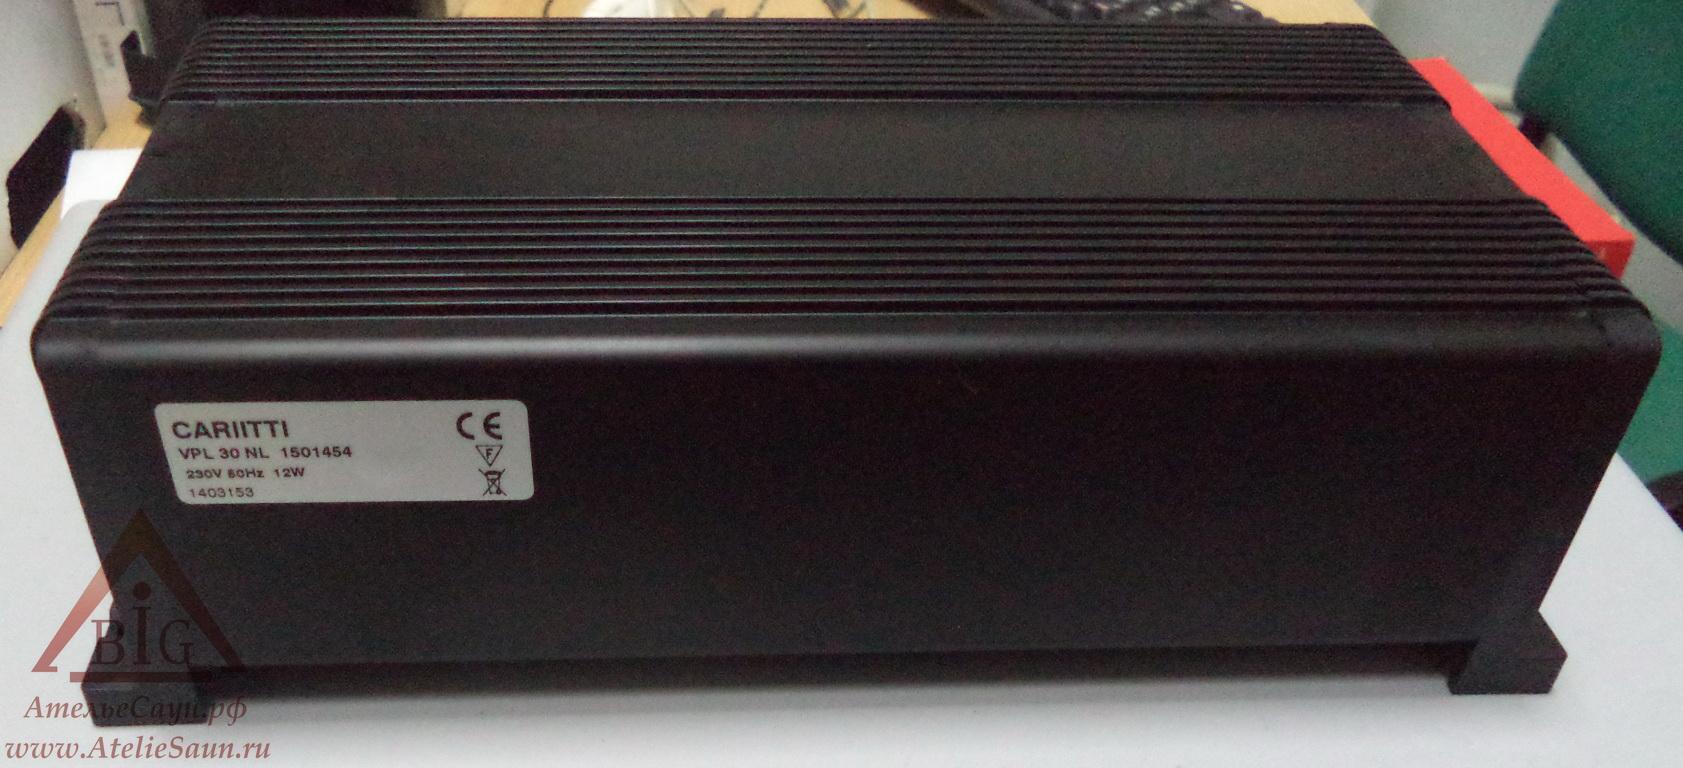 Проектор Cariitti VPL 30 NL (1501454, IP65, Северное сияние, внутренняя установка)